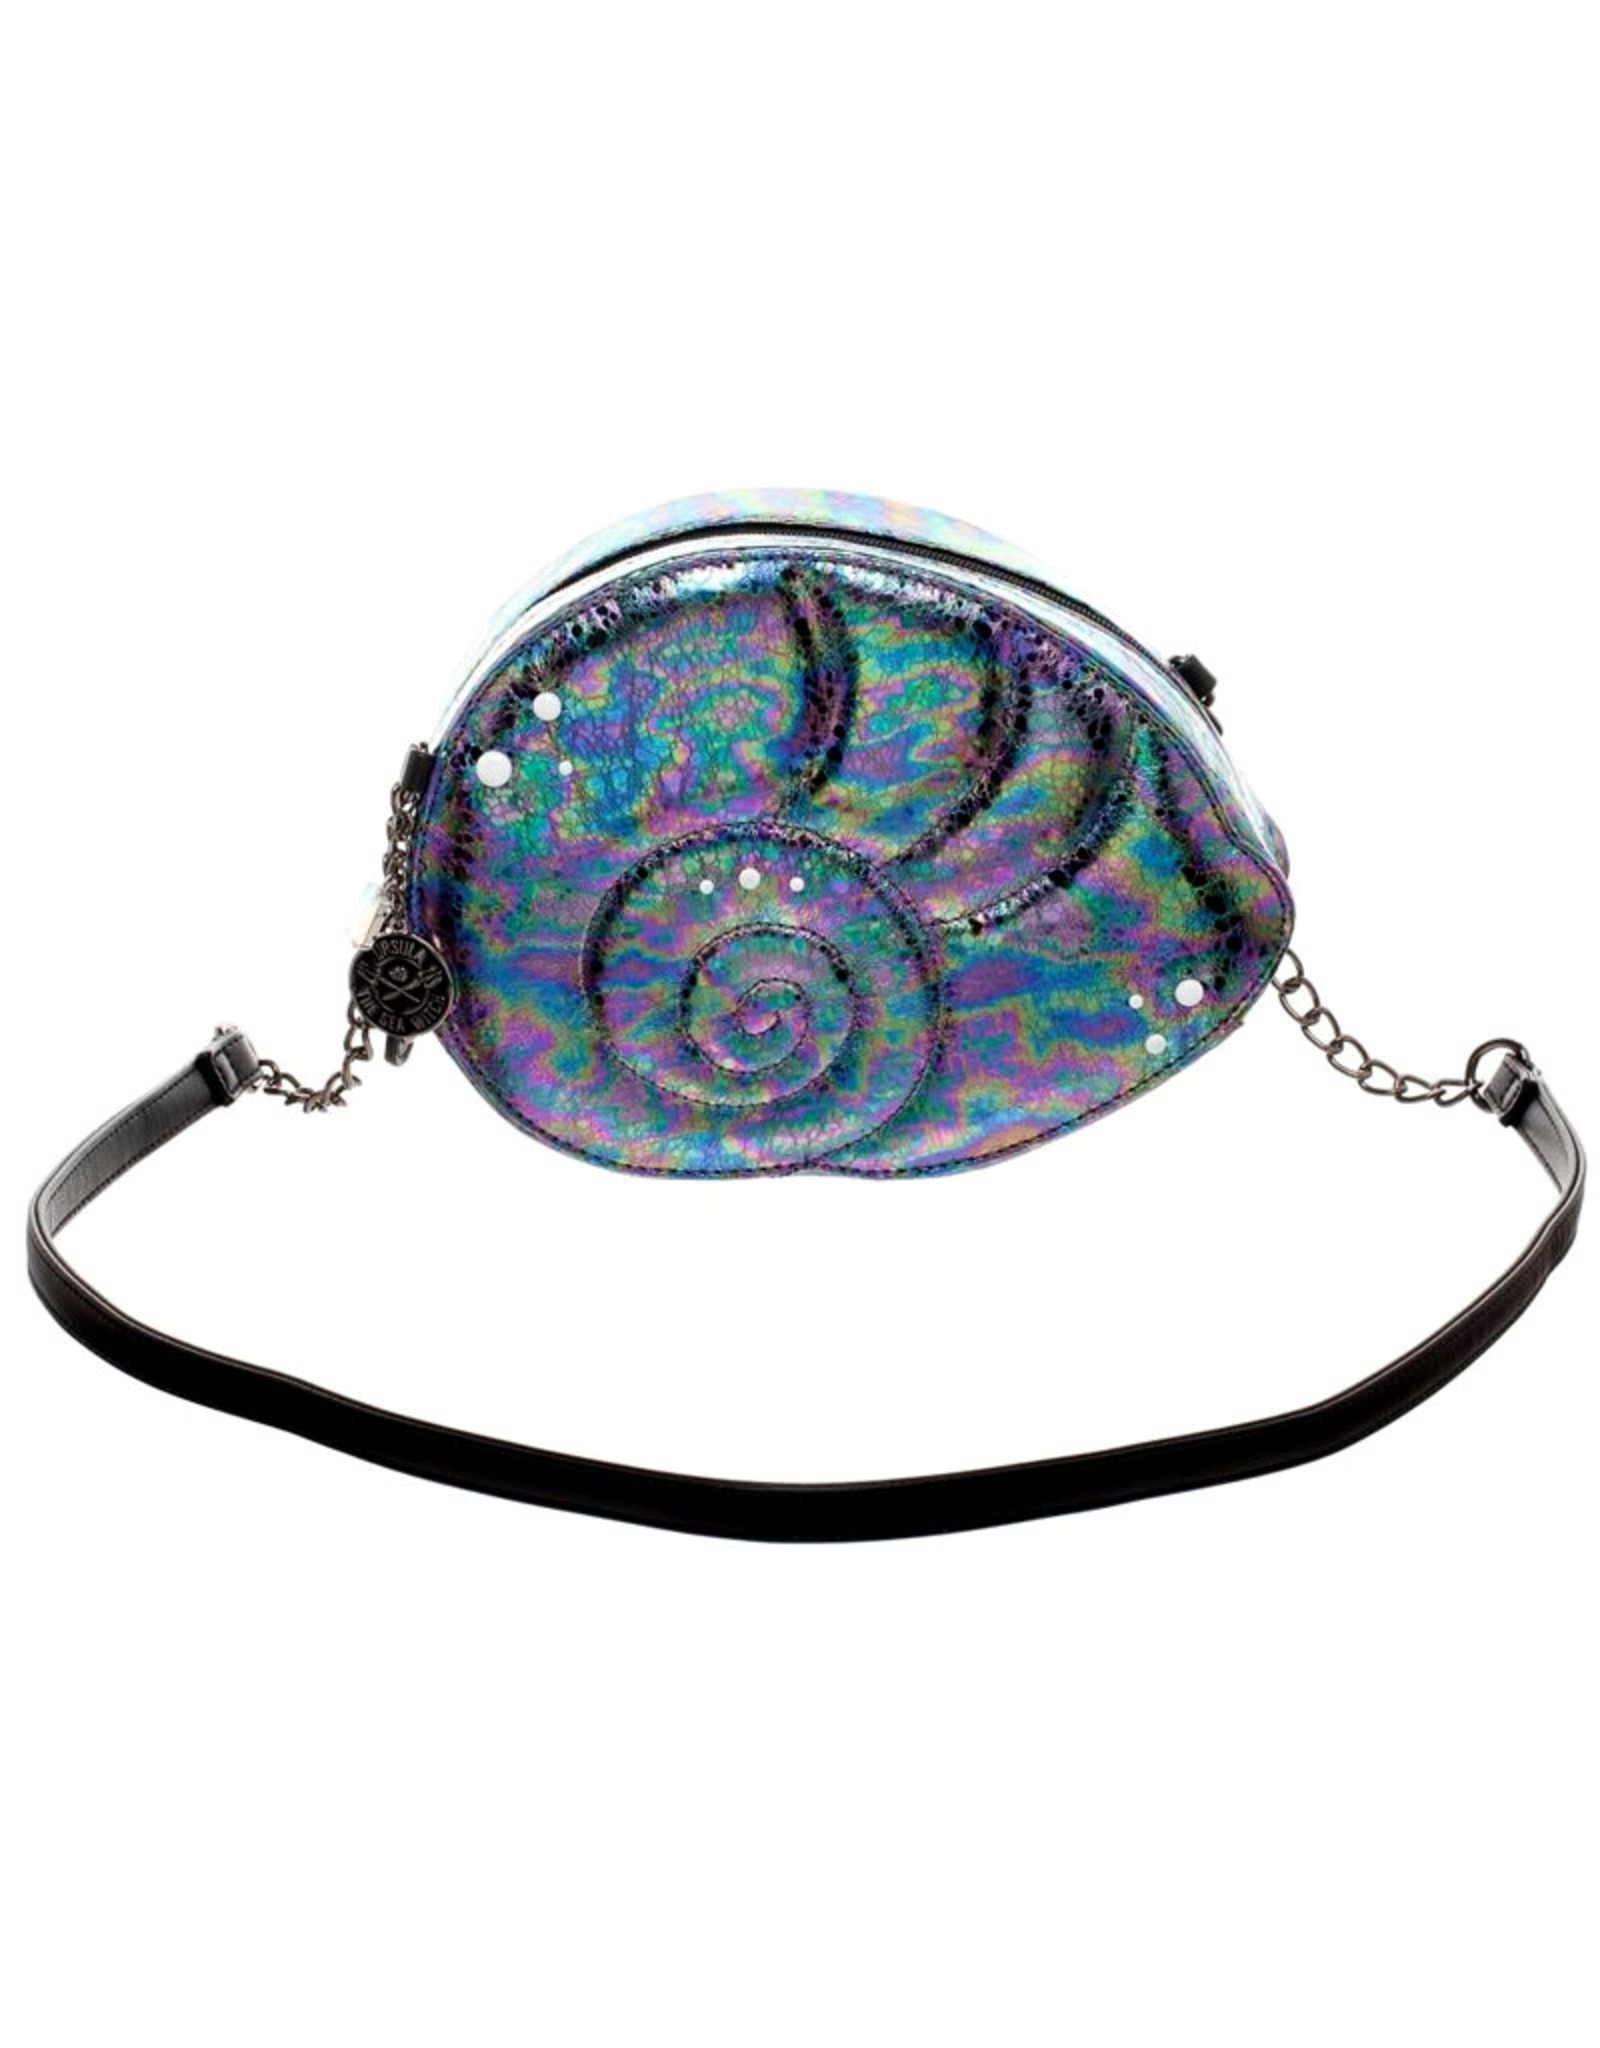 Disney Disney ( Handbag ) Ursula